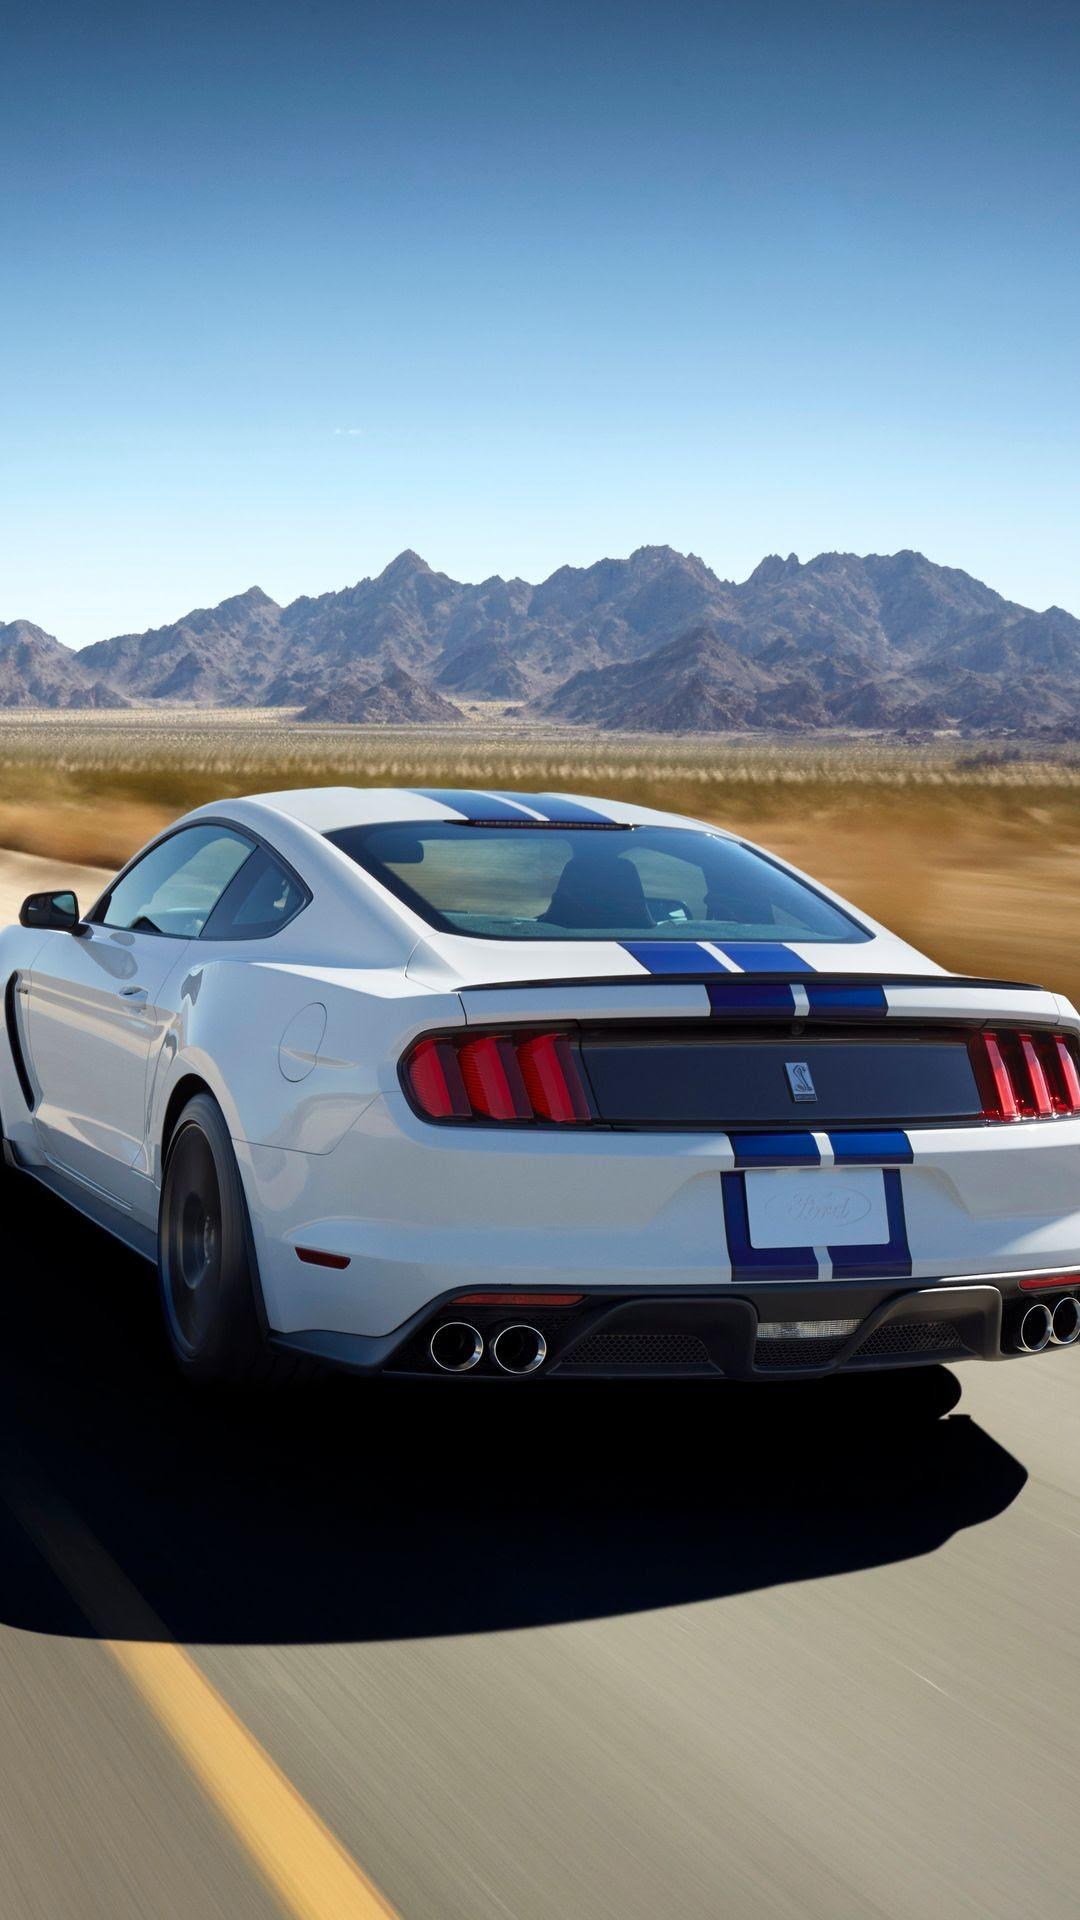 Mustang Iphone Wallpaper 76 Images